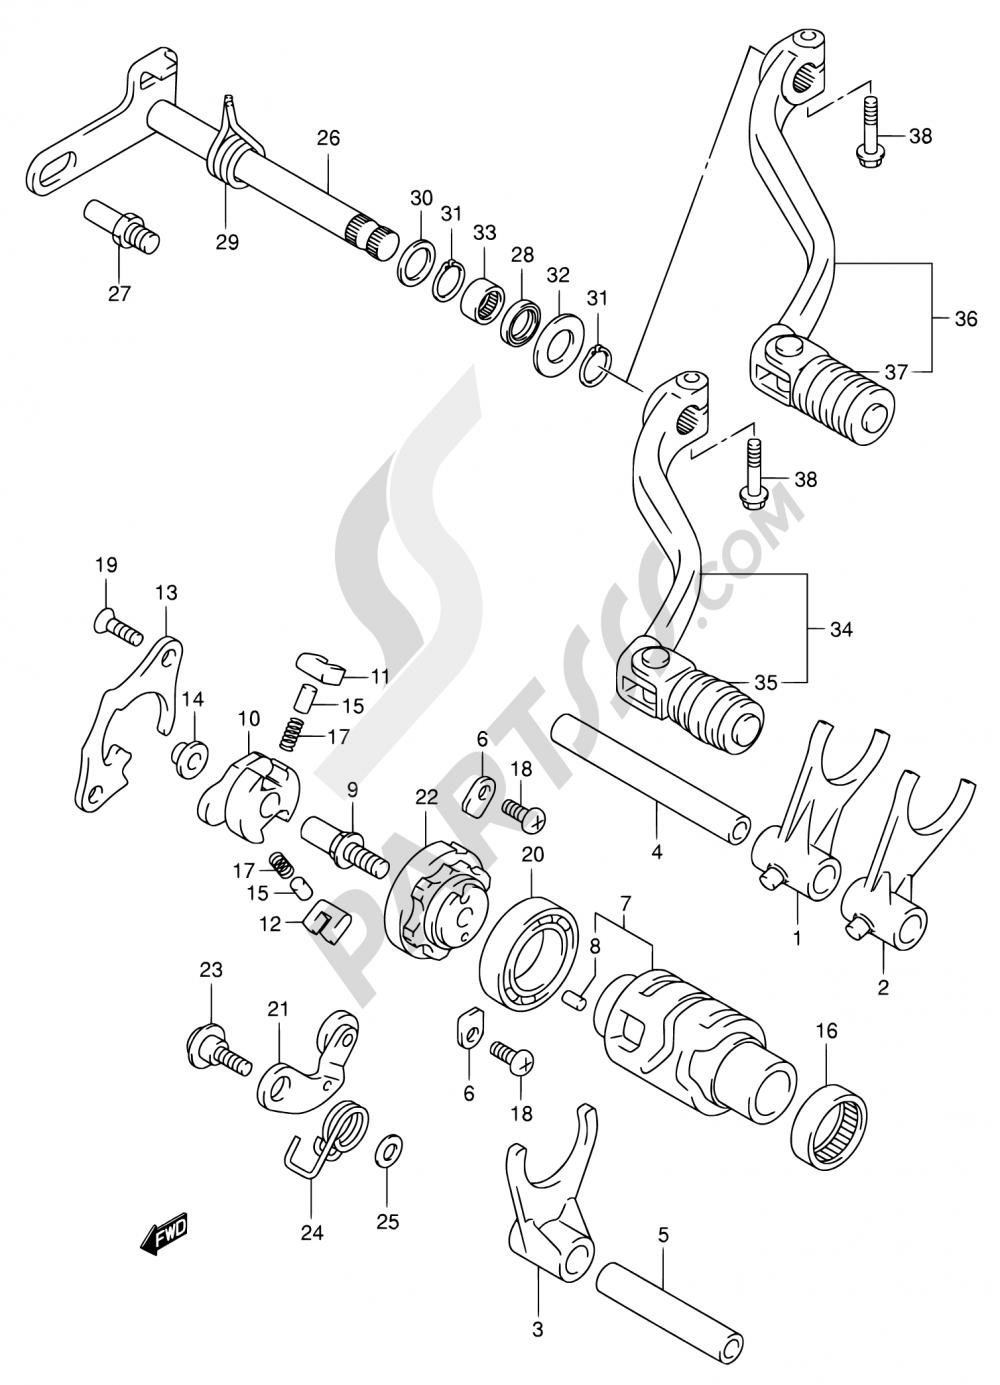 21 - GEAR SHIFTING (NOTE) Suzuki DR-Z400 2000